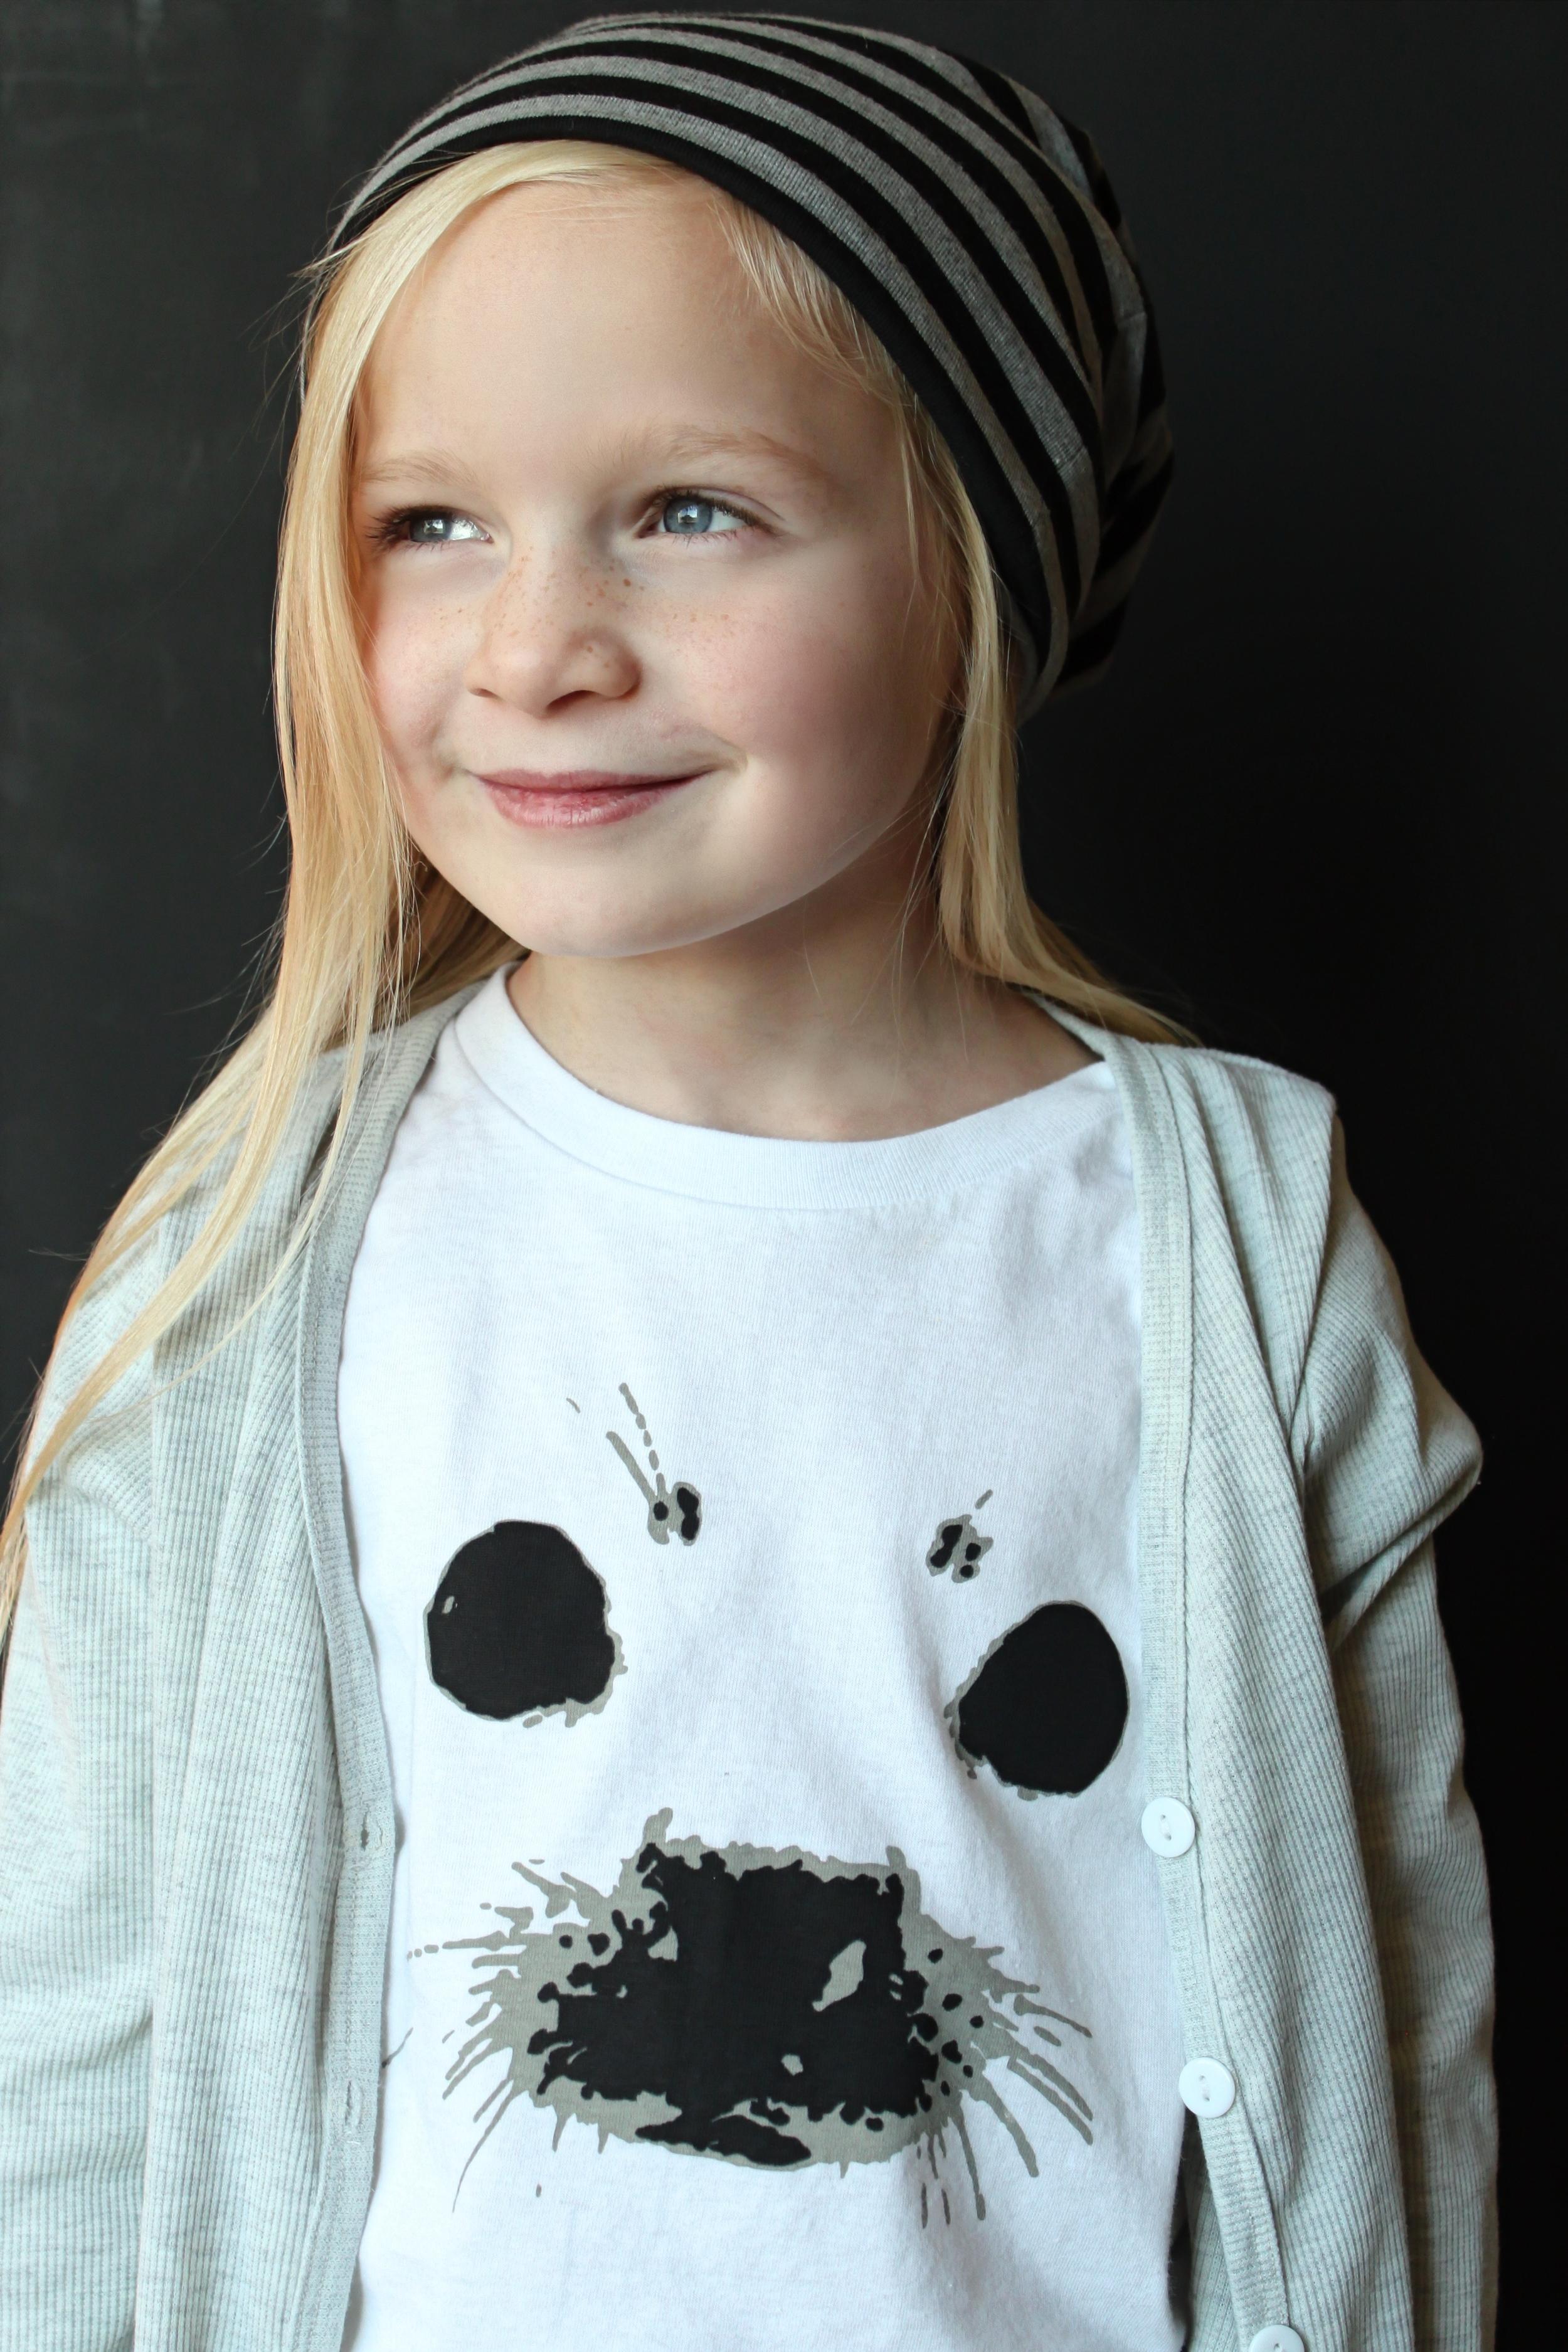 kid fashion kid+kind kidandkind browntown styleblog